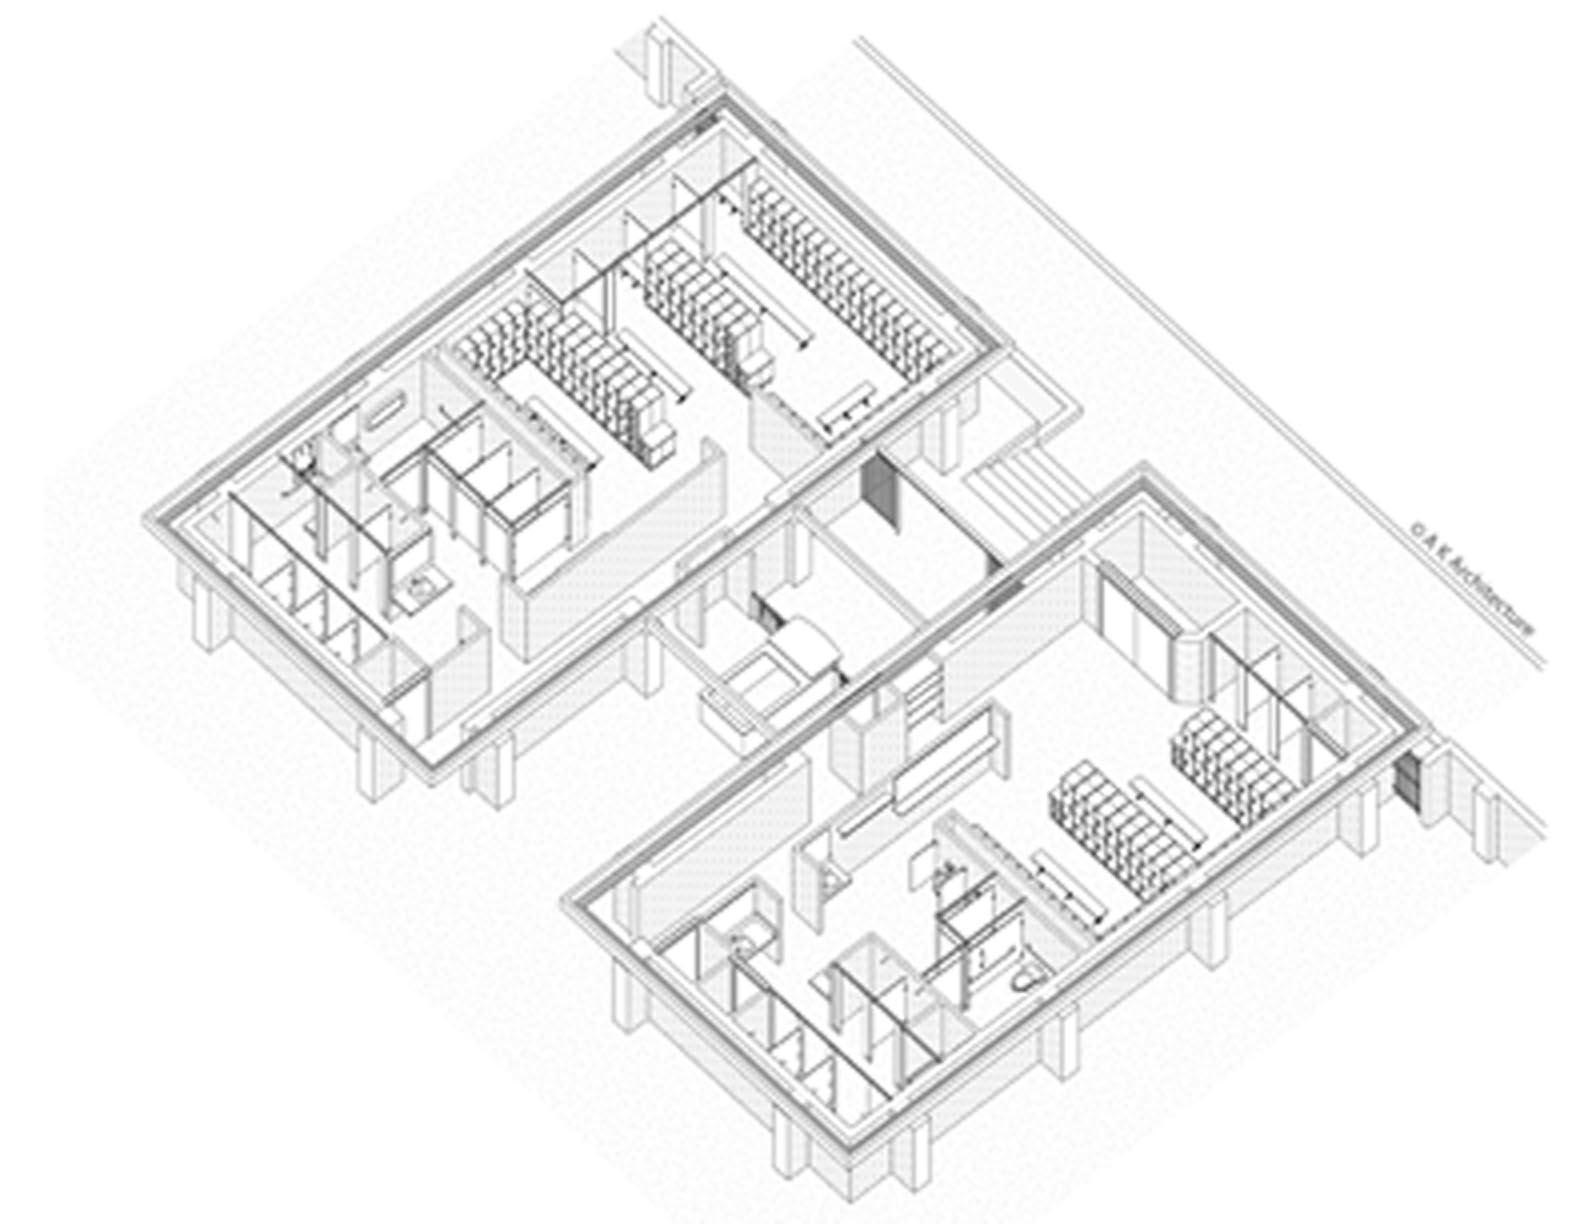 1584x1224 Bedroom House Floor Plans With Garage2799 Room Plan Event Layout